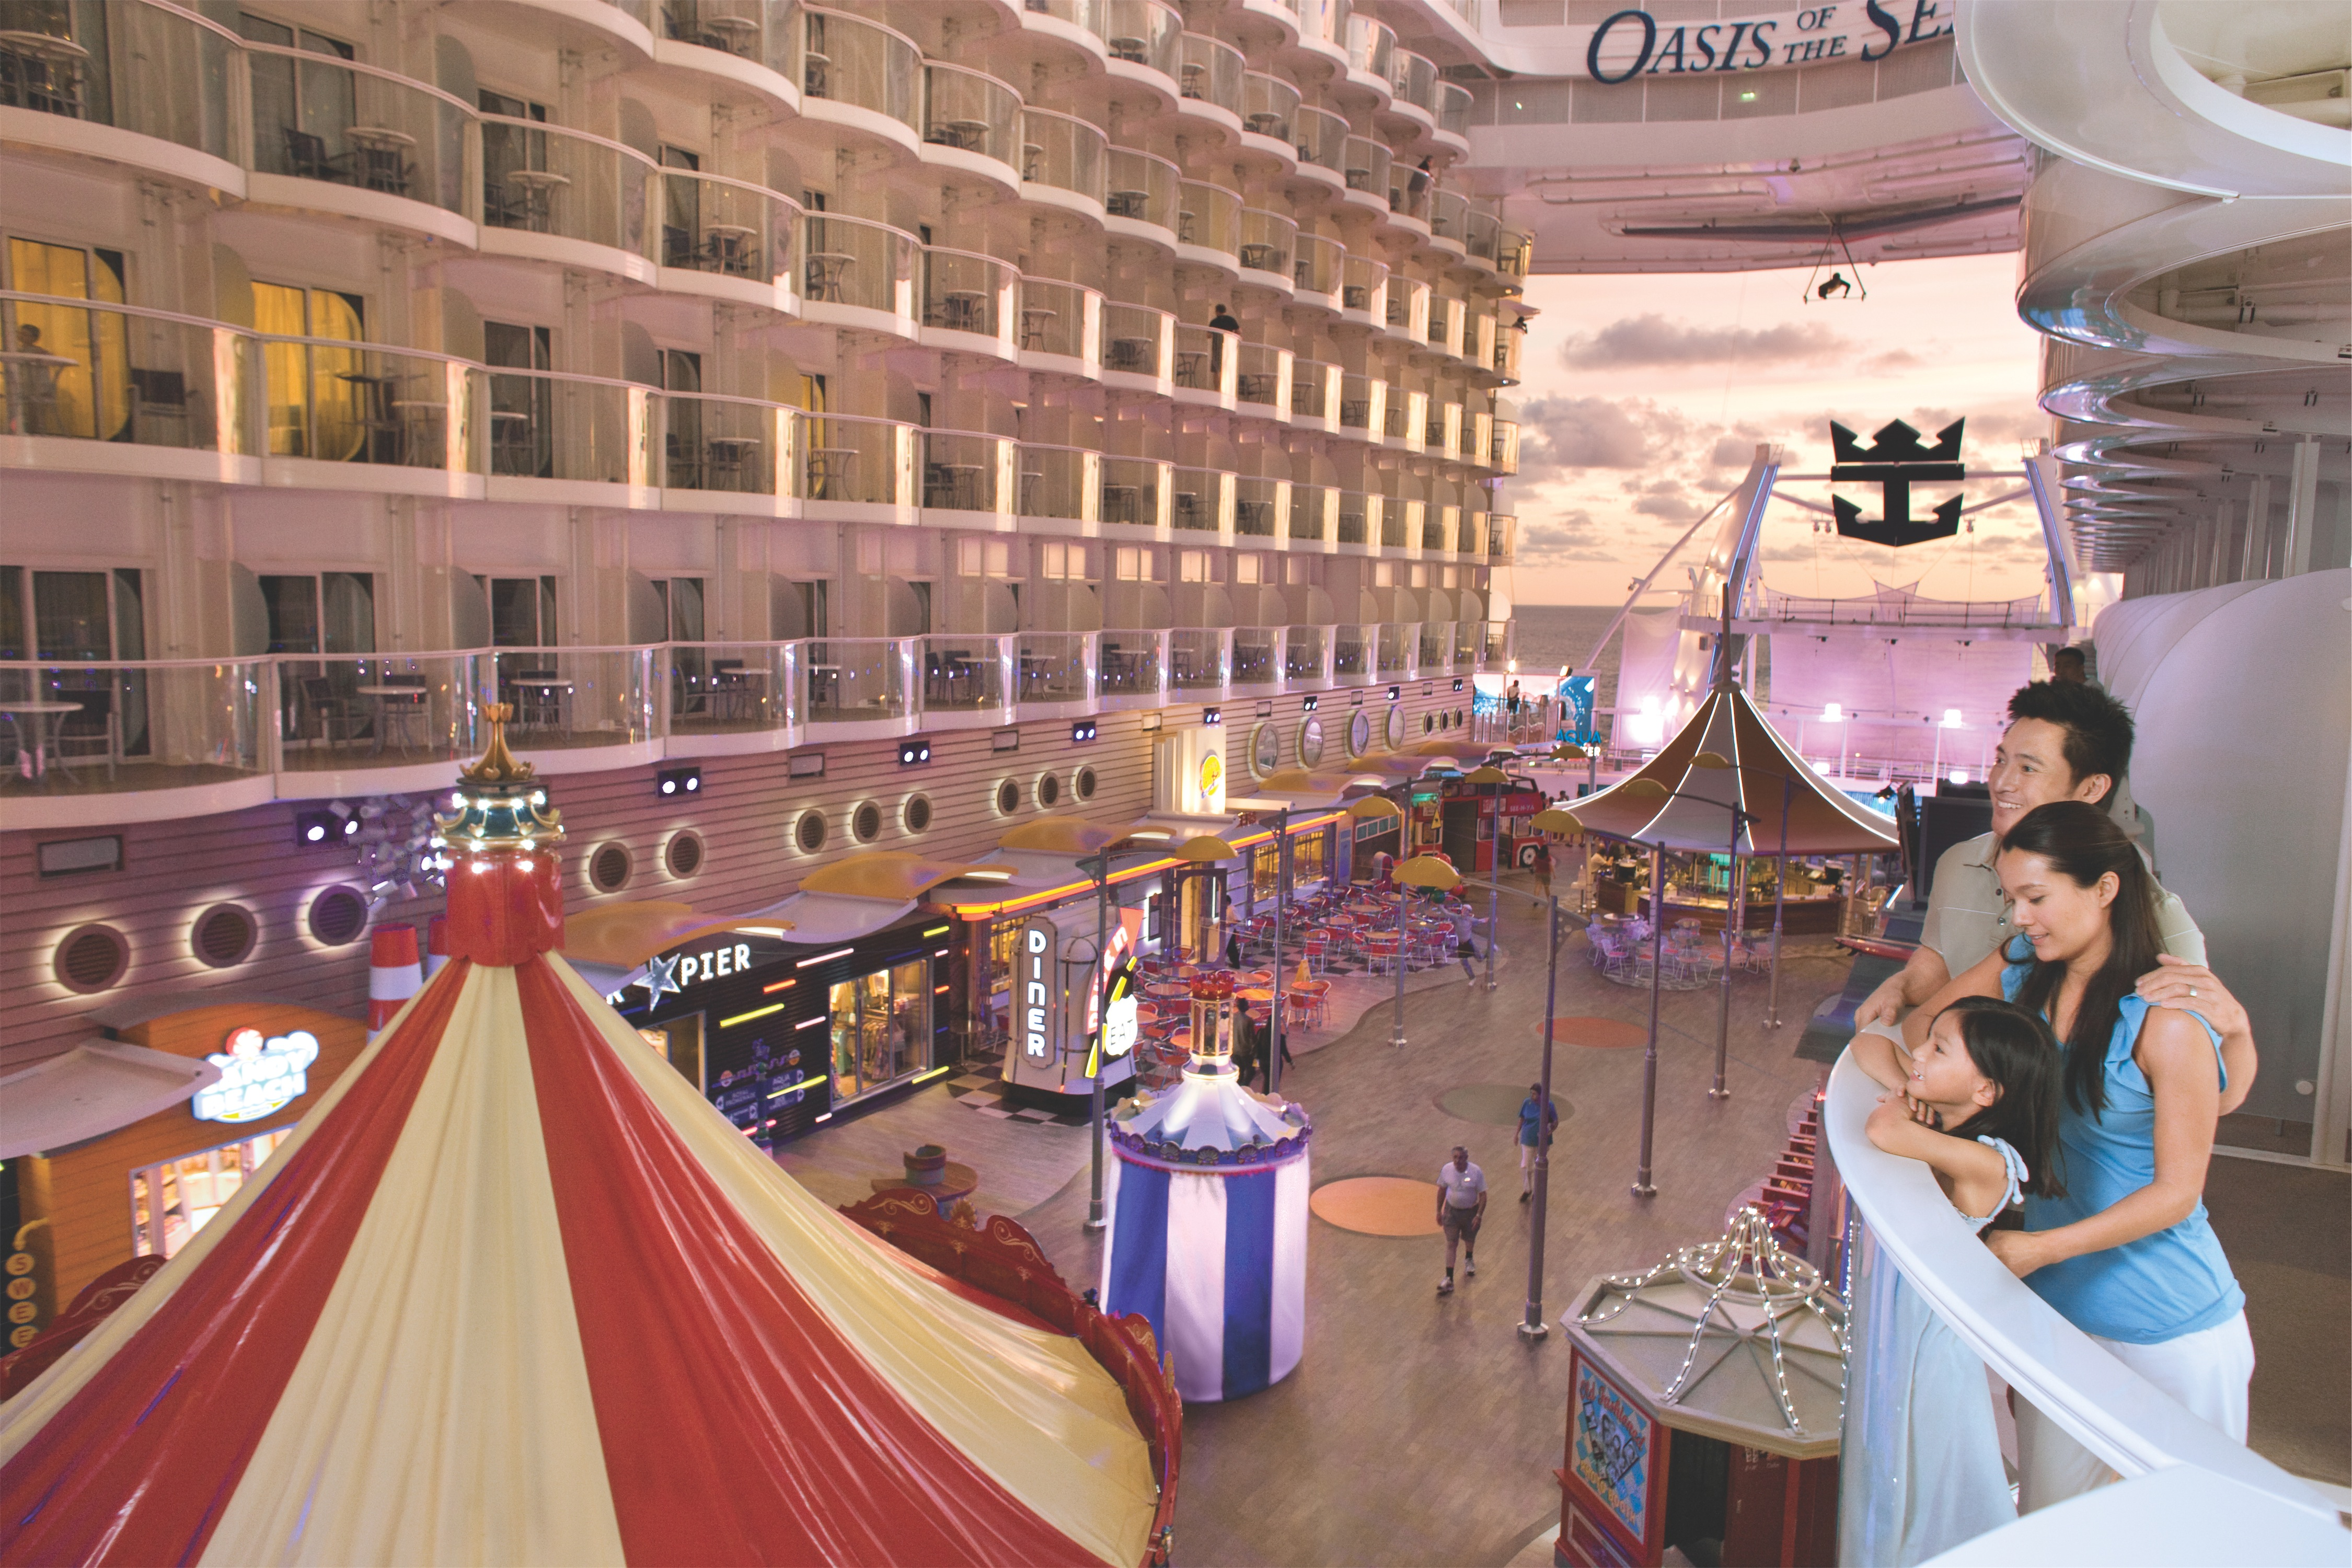 Royal Caribbean International Oasis of the Seas Interior Boardwalk Balcony Family.jpg